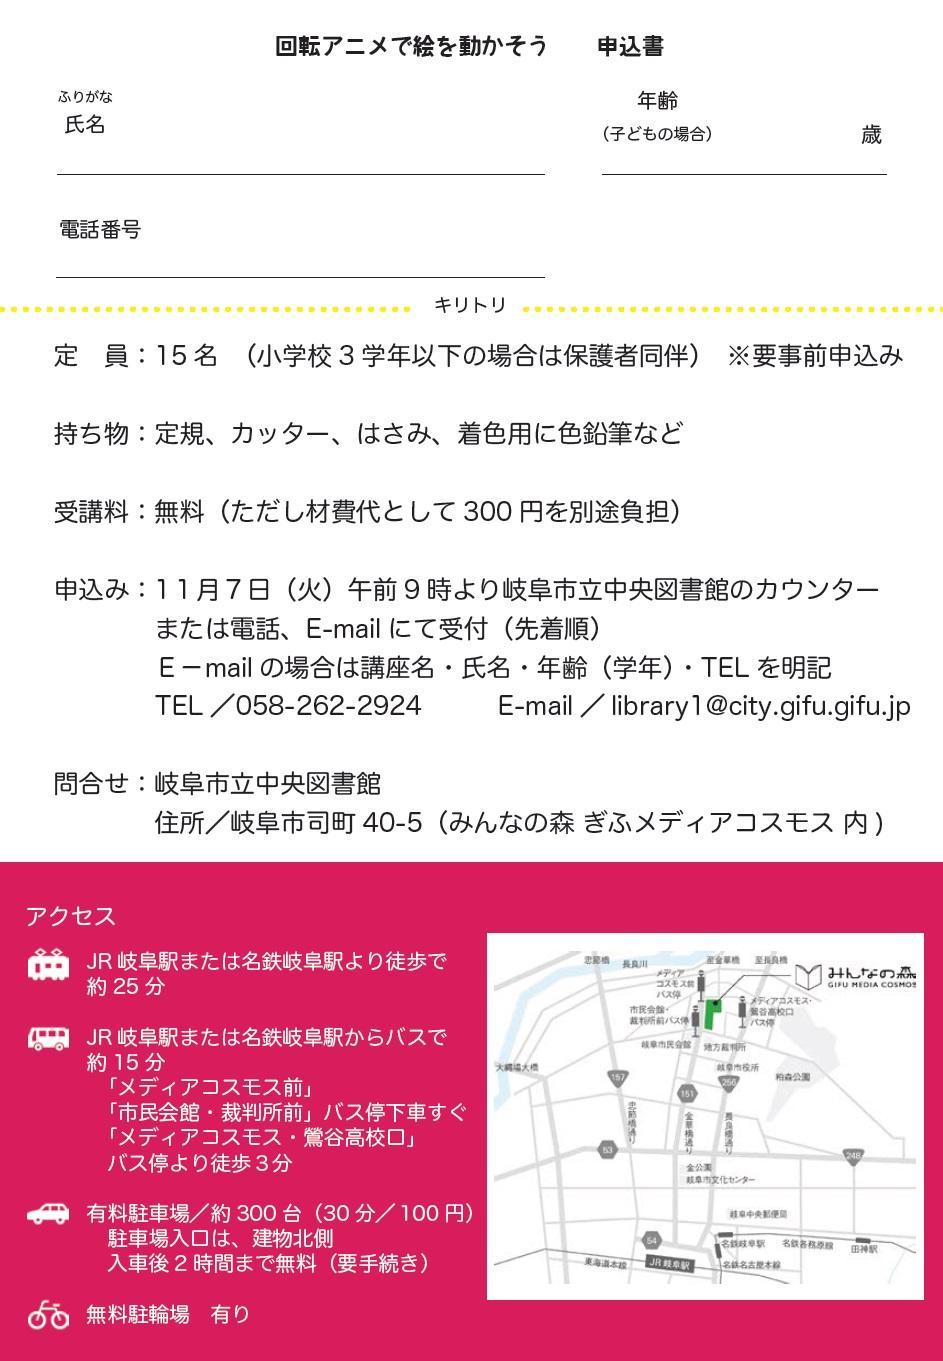 http://g-mediacosmos.jp/lib/information/file/181a15381bbdf476060a2a3d7001460ca25e4123.jpg